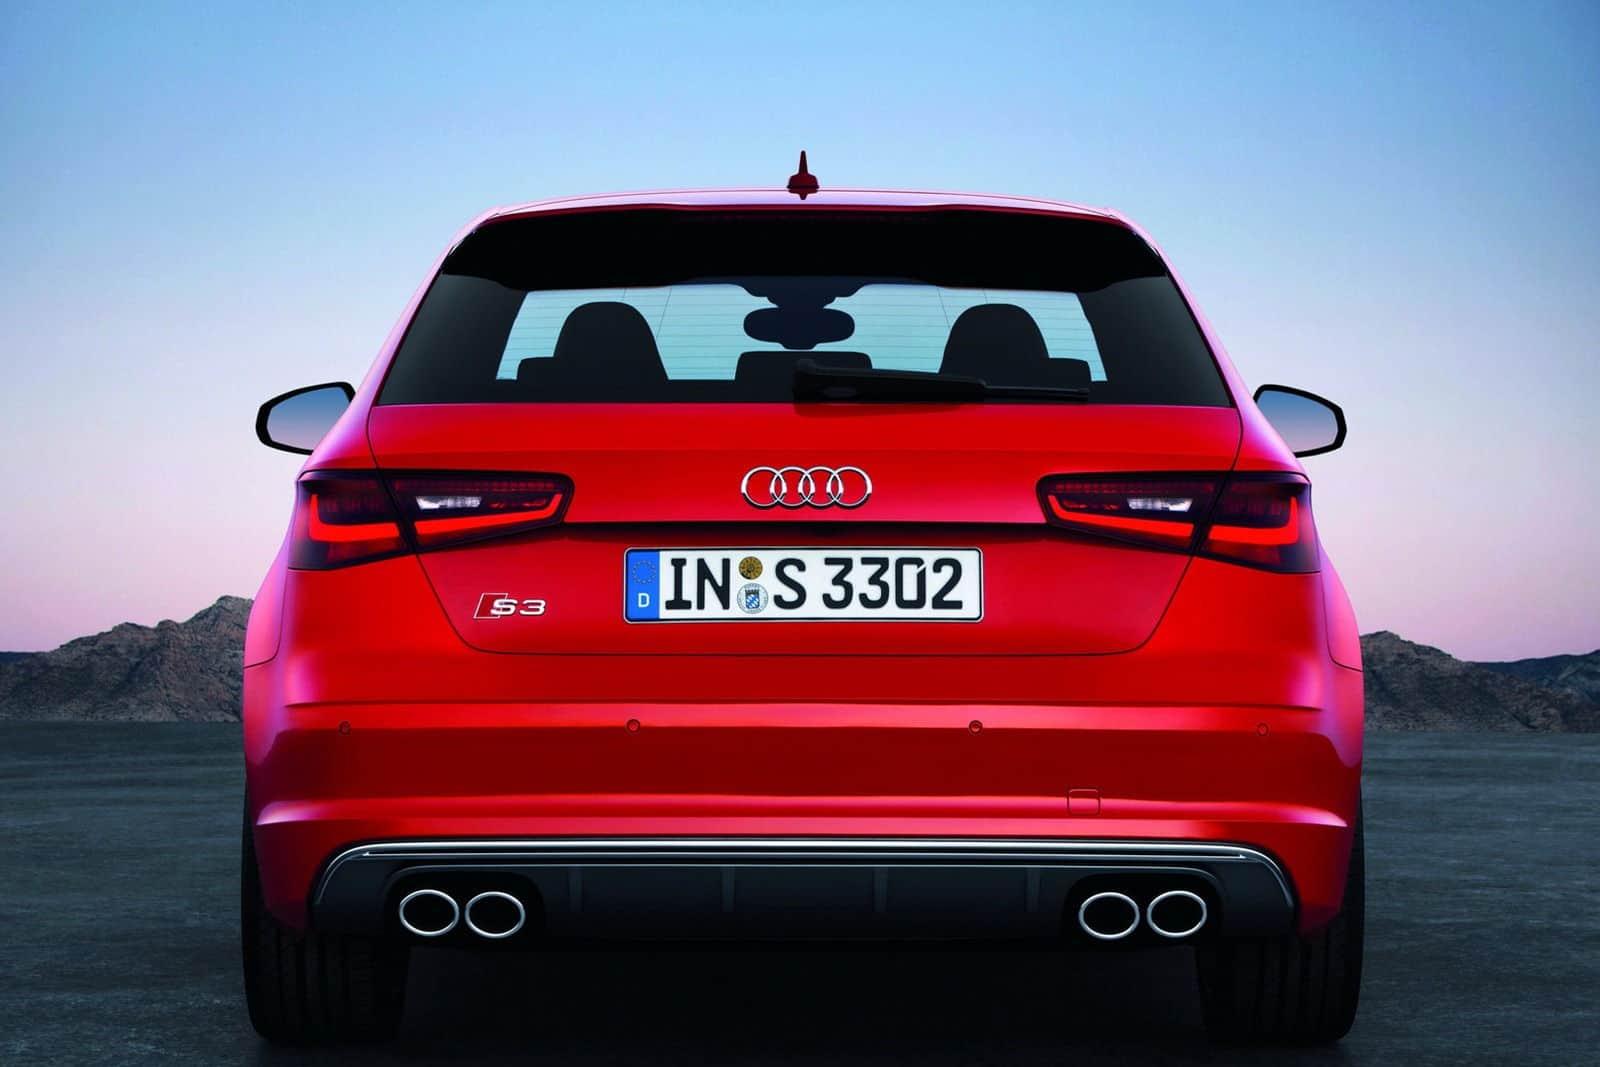 2013 Audi S3 Hatchback rear